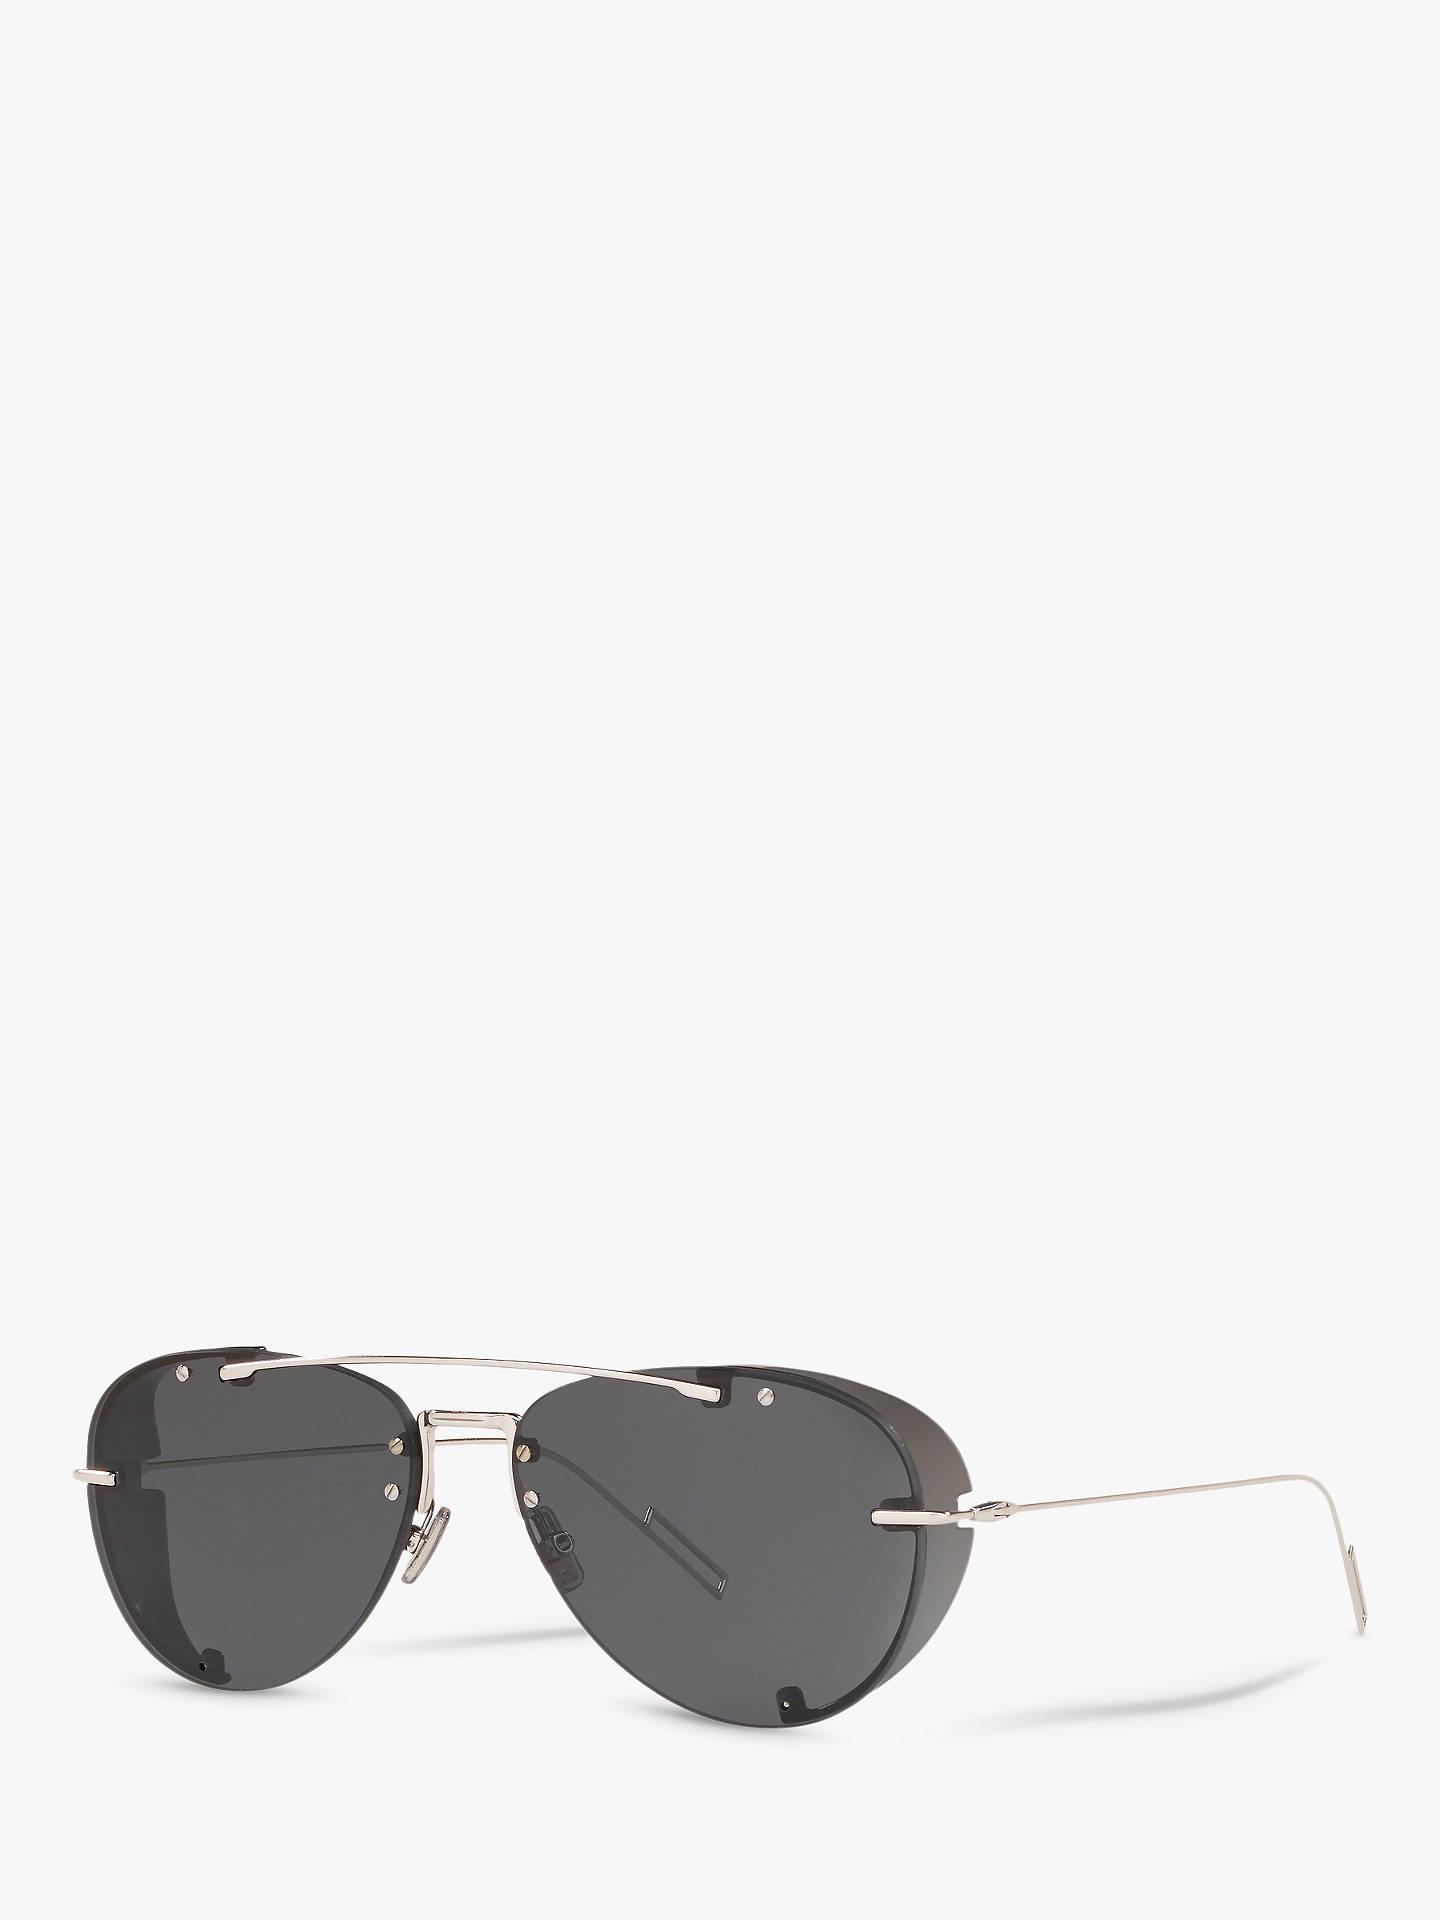 6ac260e1a7b5 Buy Dior DiorChroma1 Women's Aviator Sunglasses, Silver/Dark Grey Online at  johnlewis. ...